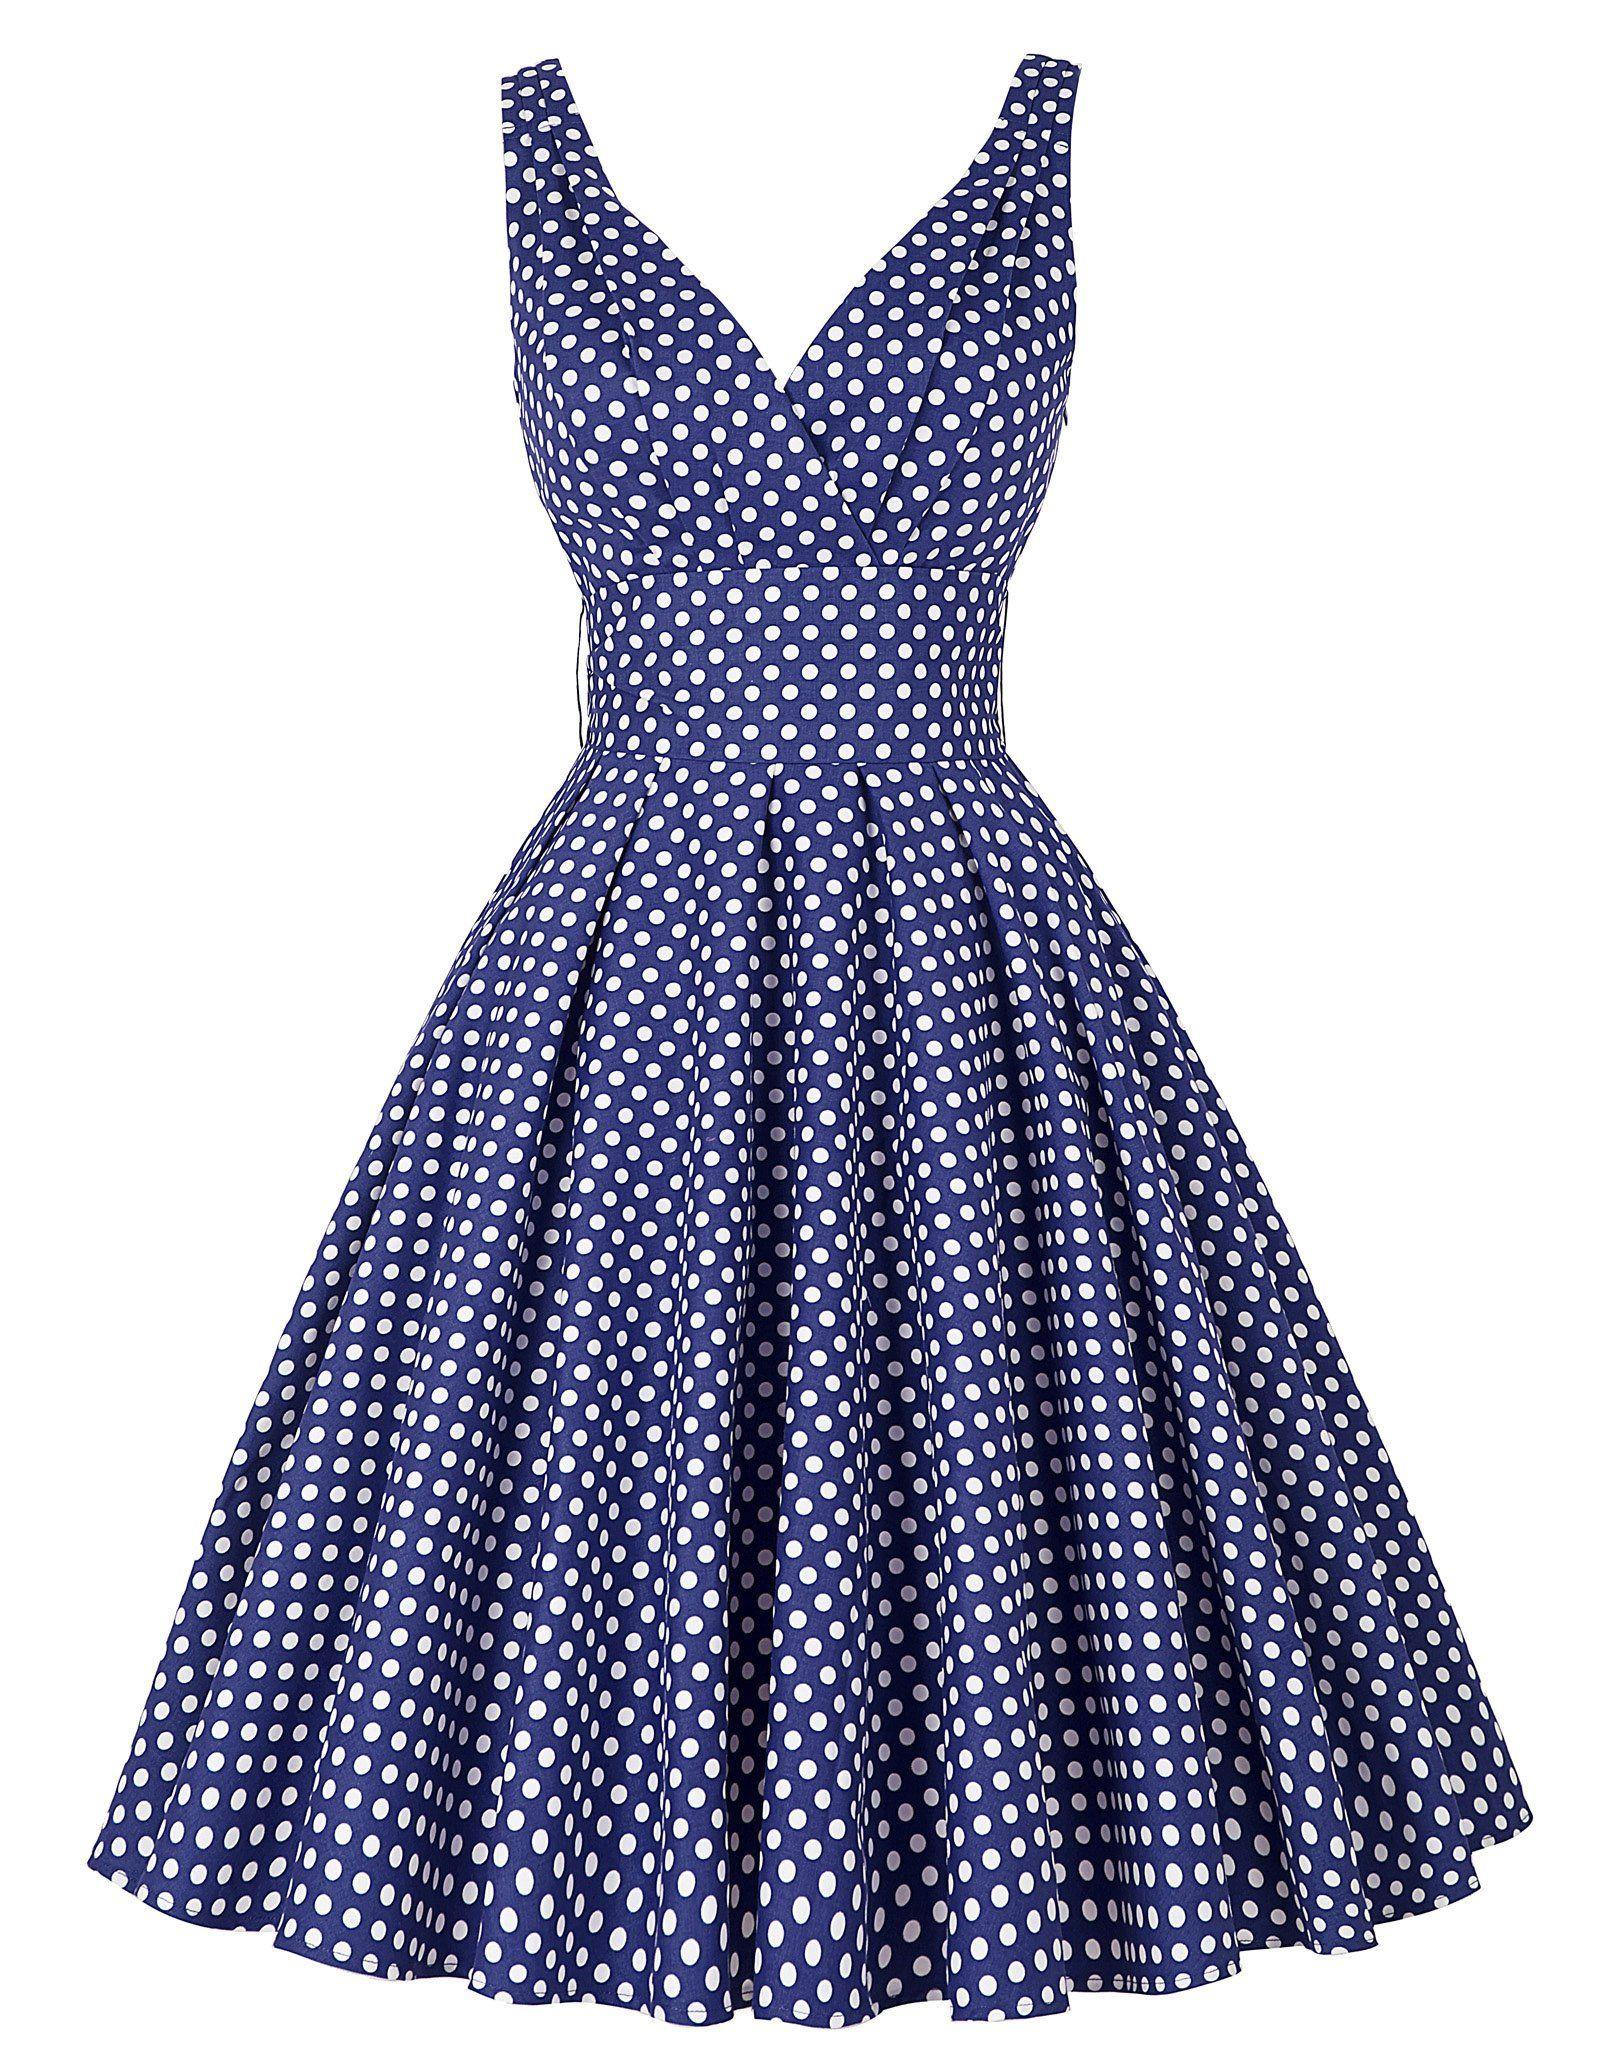 Classy Women s Deep V-Neck Polka Dot Vintage Party Dress Navy Blue(L) Love  this dress! -rcc 9b3fde835